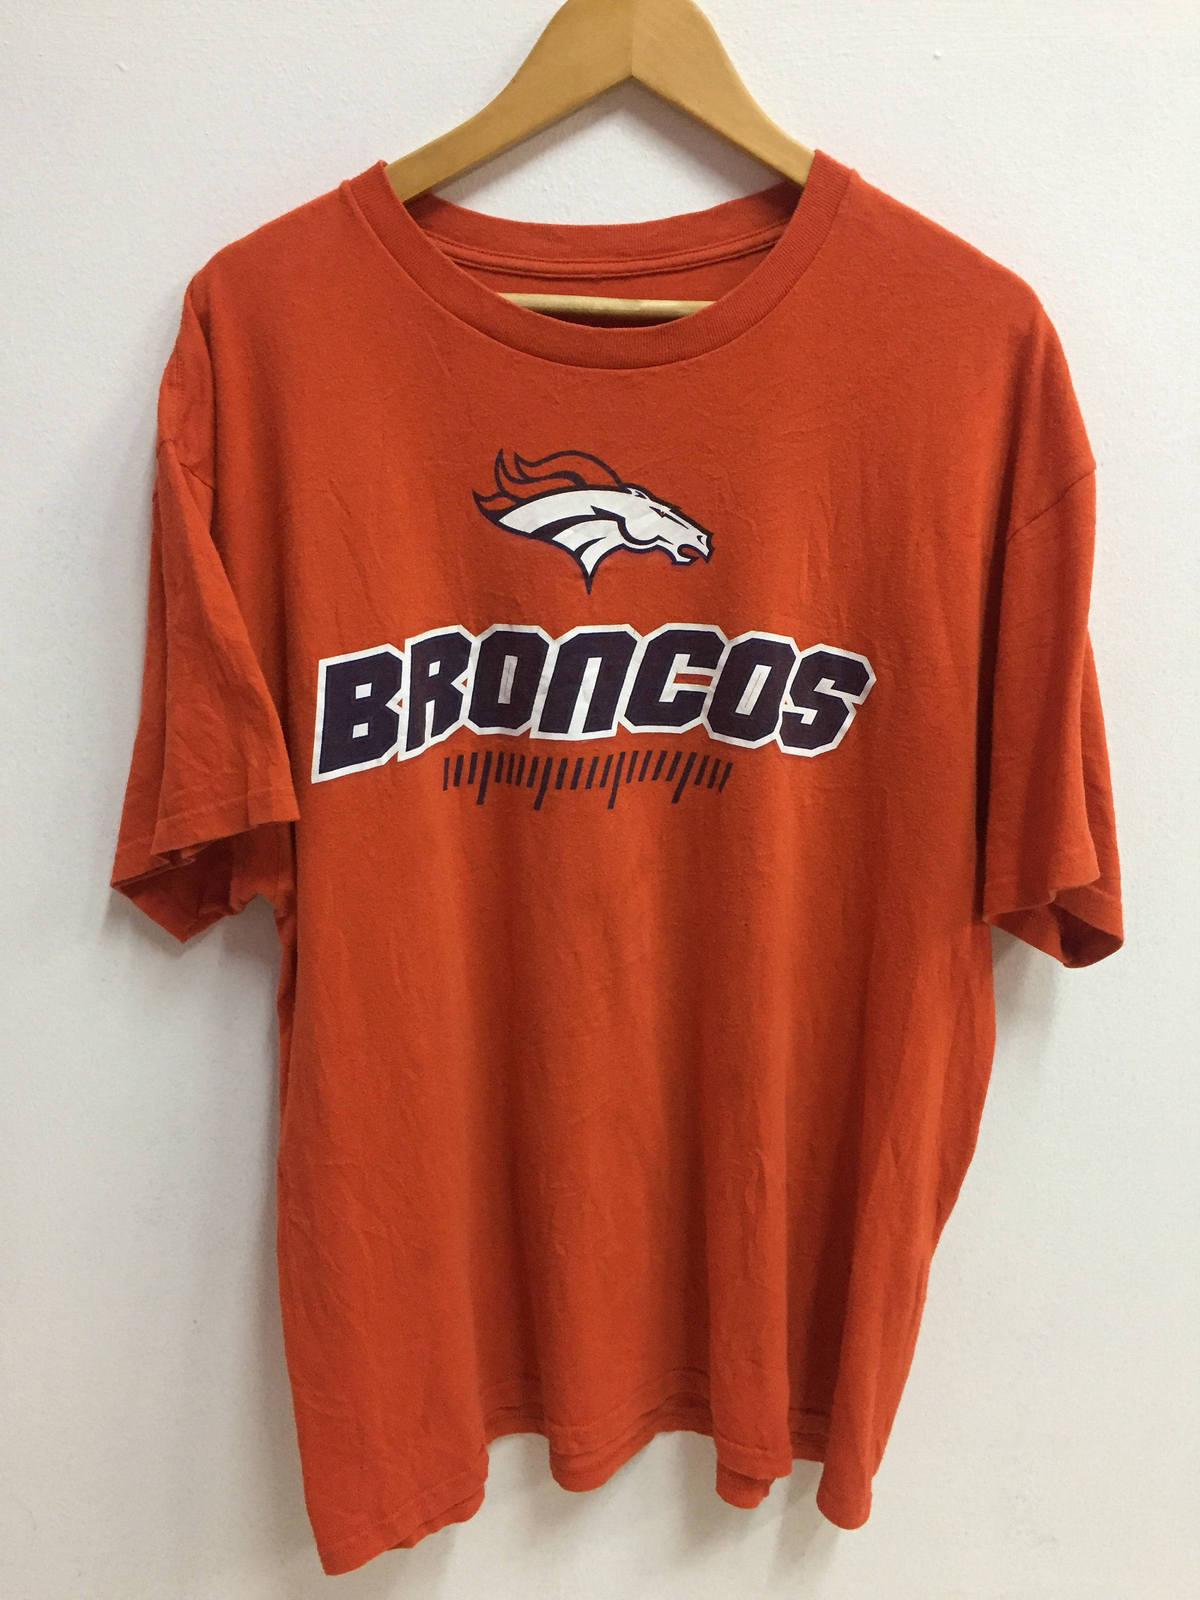 Il fullxfull.1200666554 s9n8. Il fullxfull.1200666554 s9n8. Previous.  Vintage Denver Broncos NFL Football Shirt Team Apparel Big ... fc2db60b9